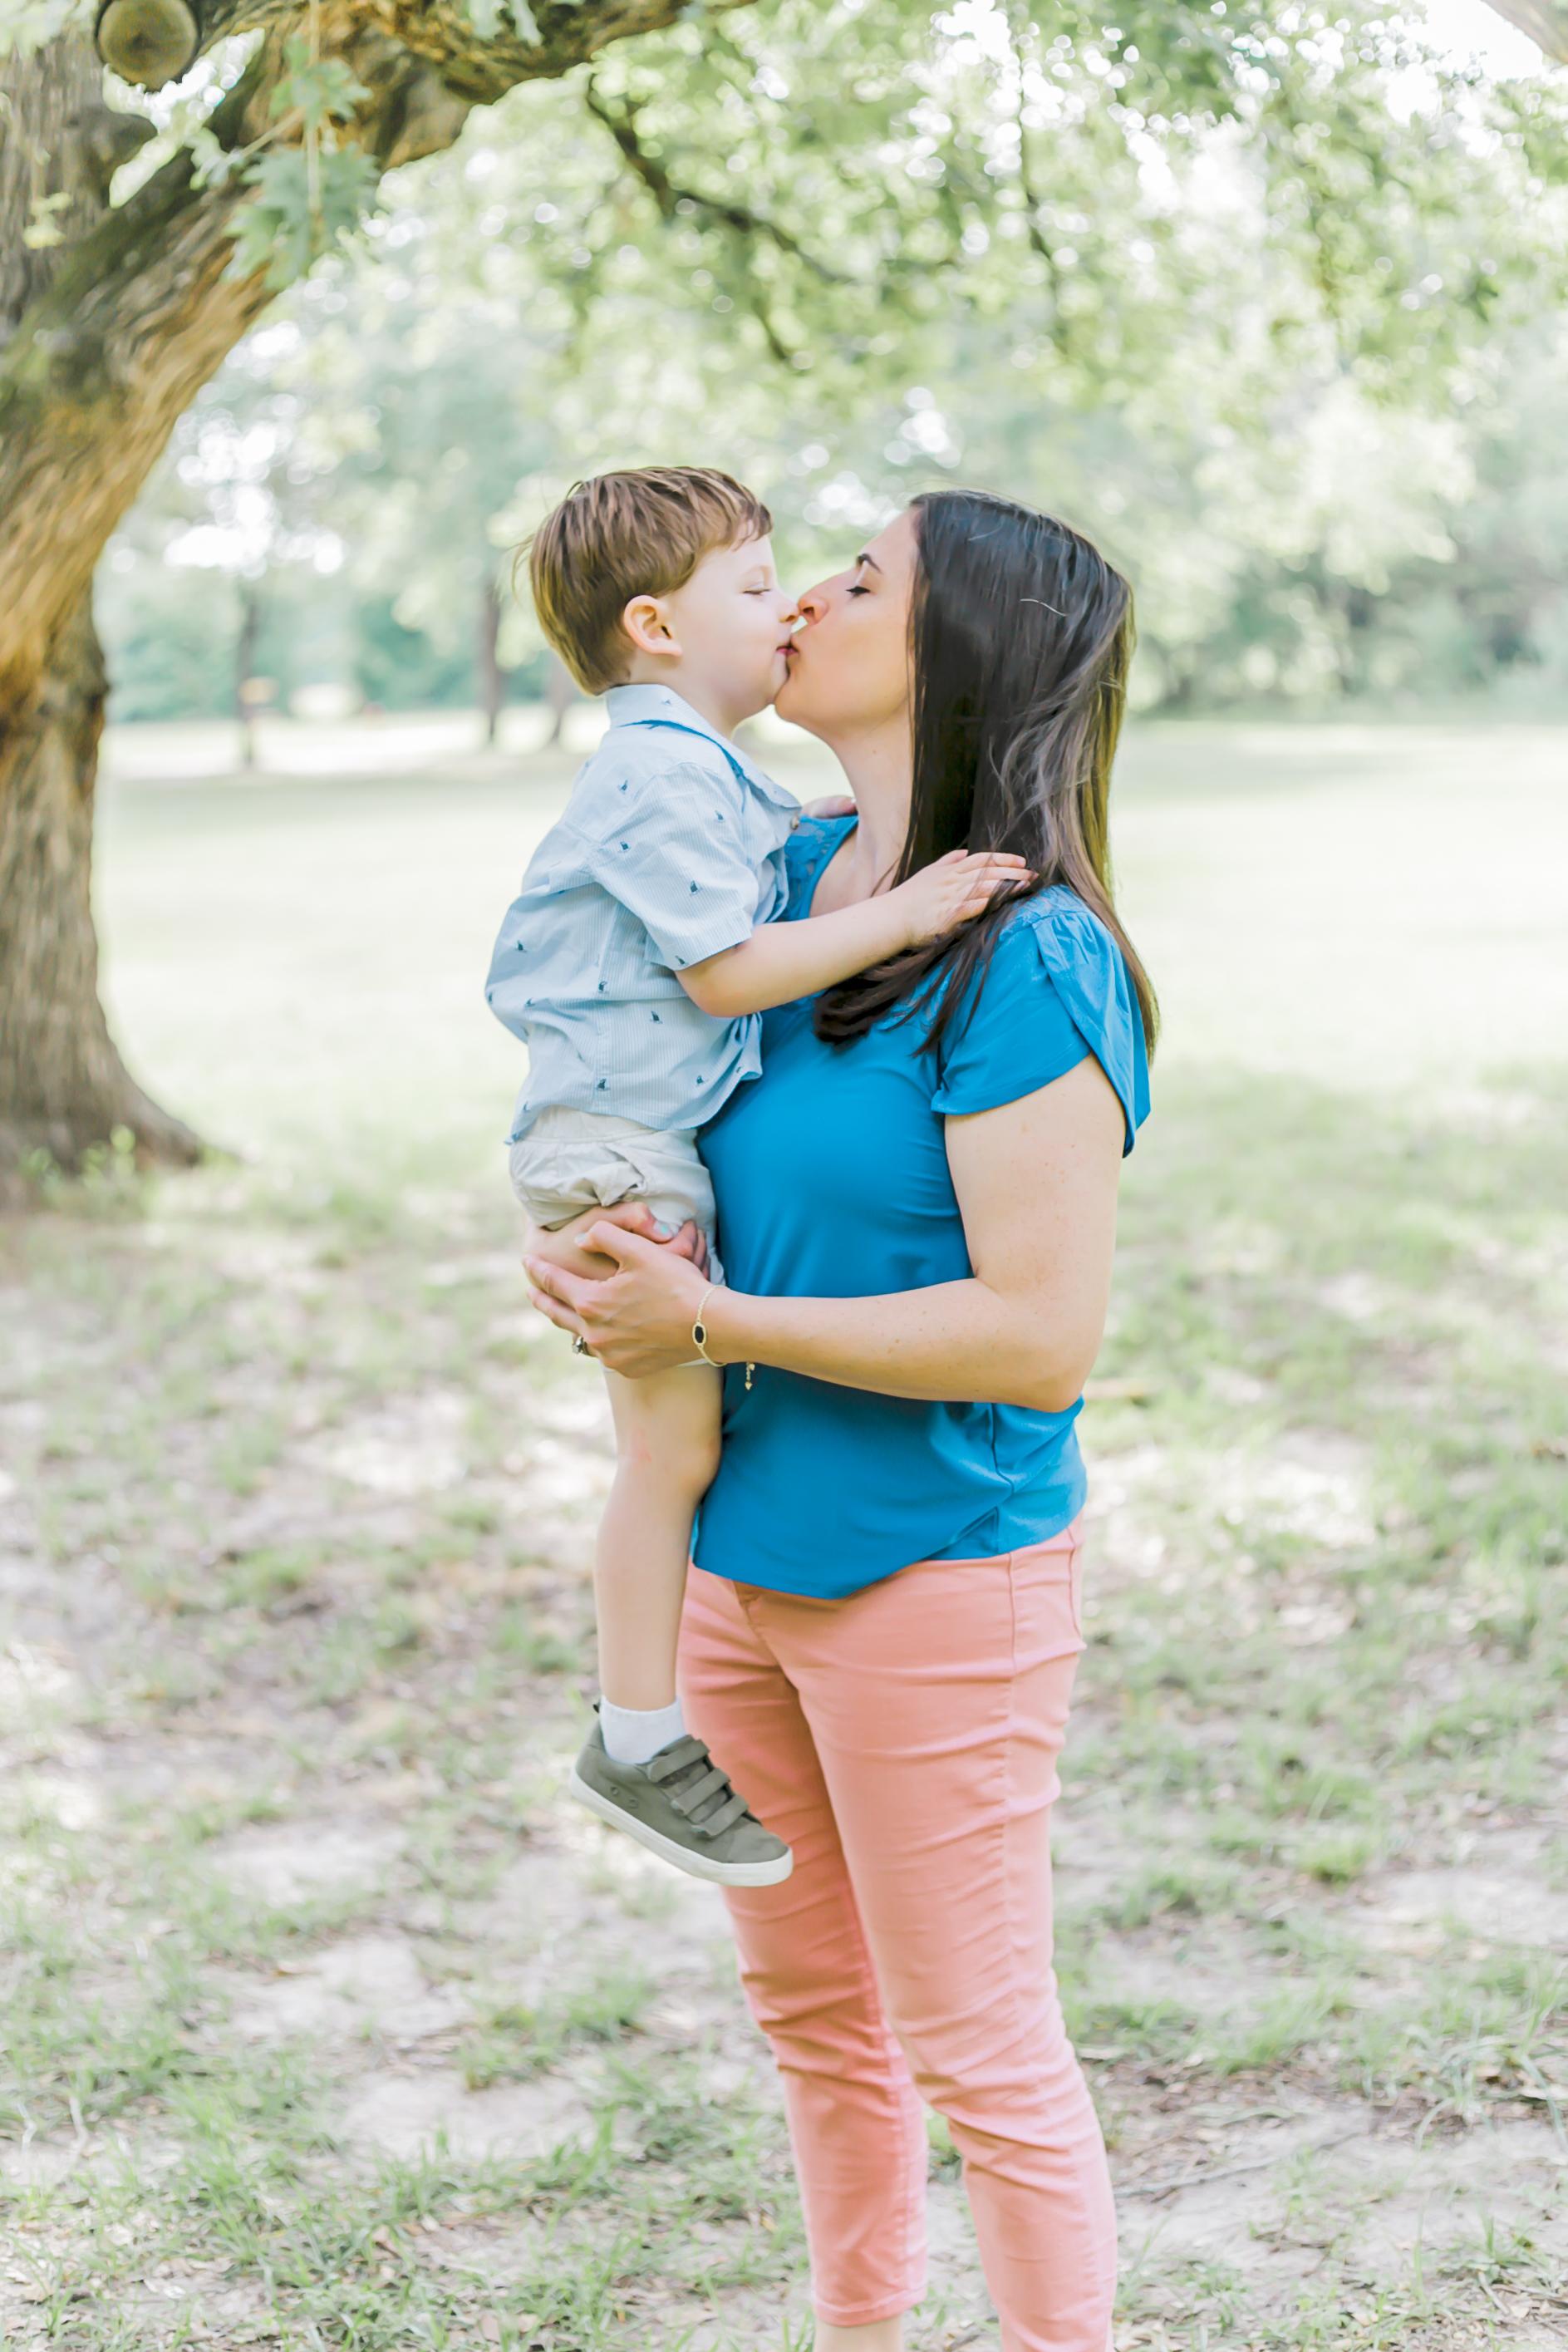 MothersDayMini-Blog-Kinnon-3.jpg